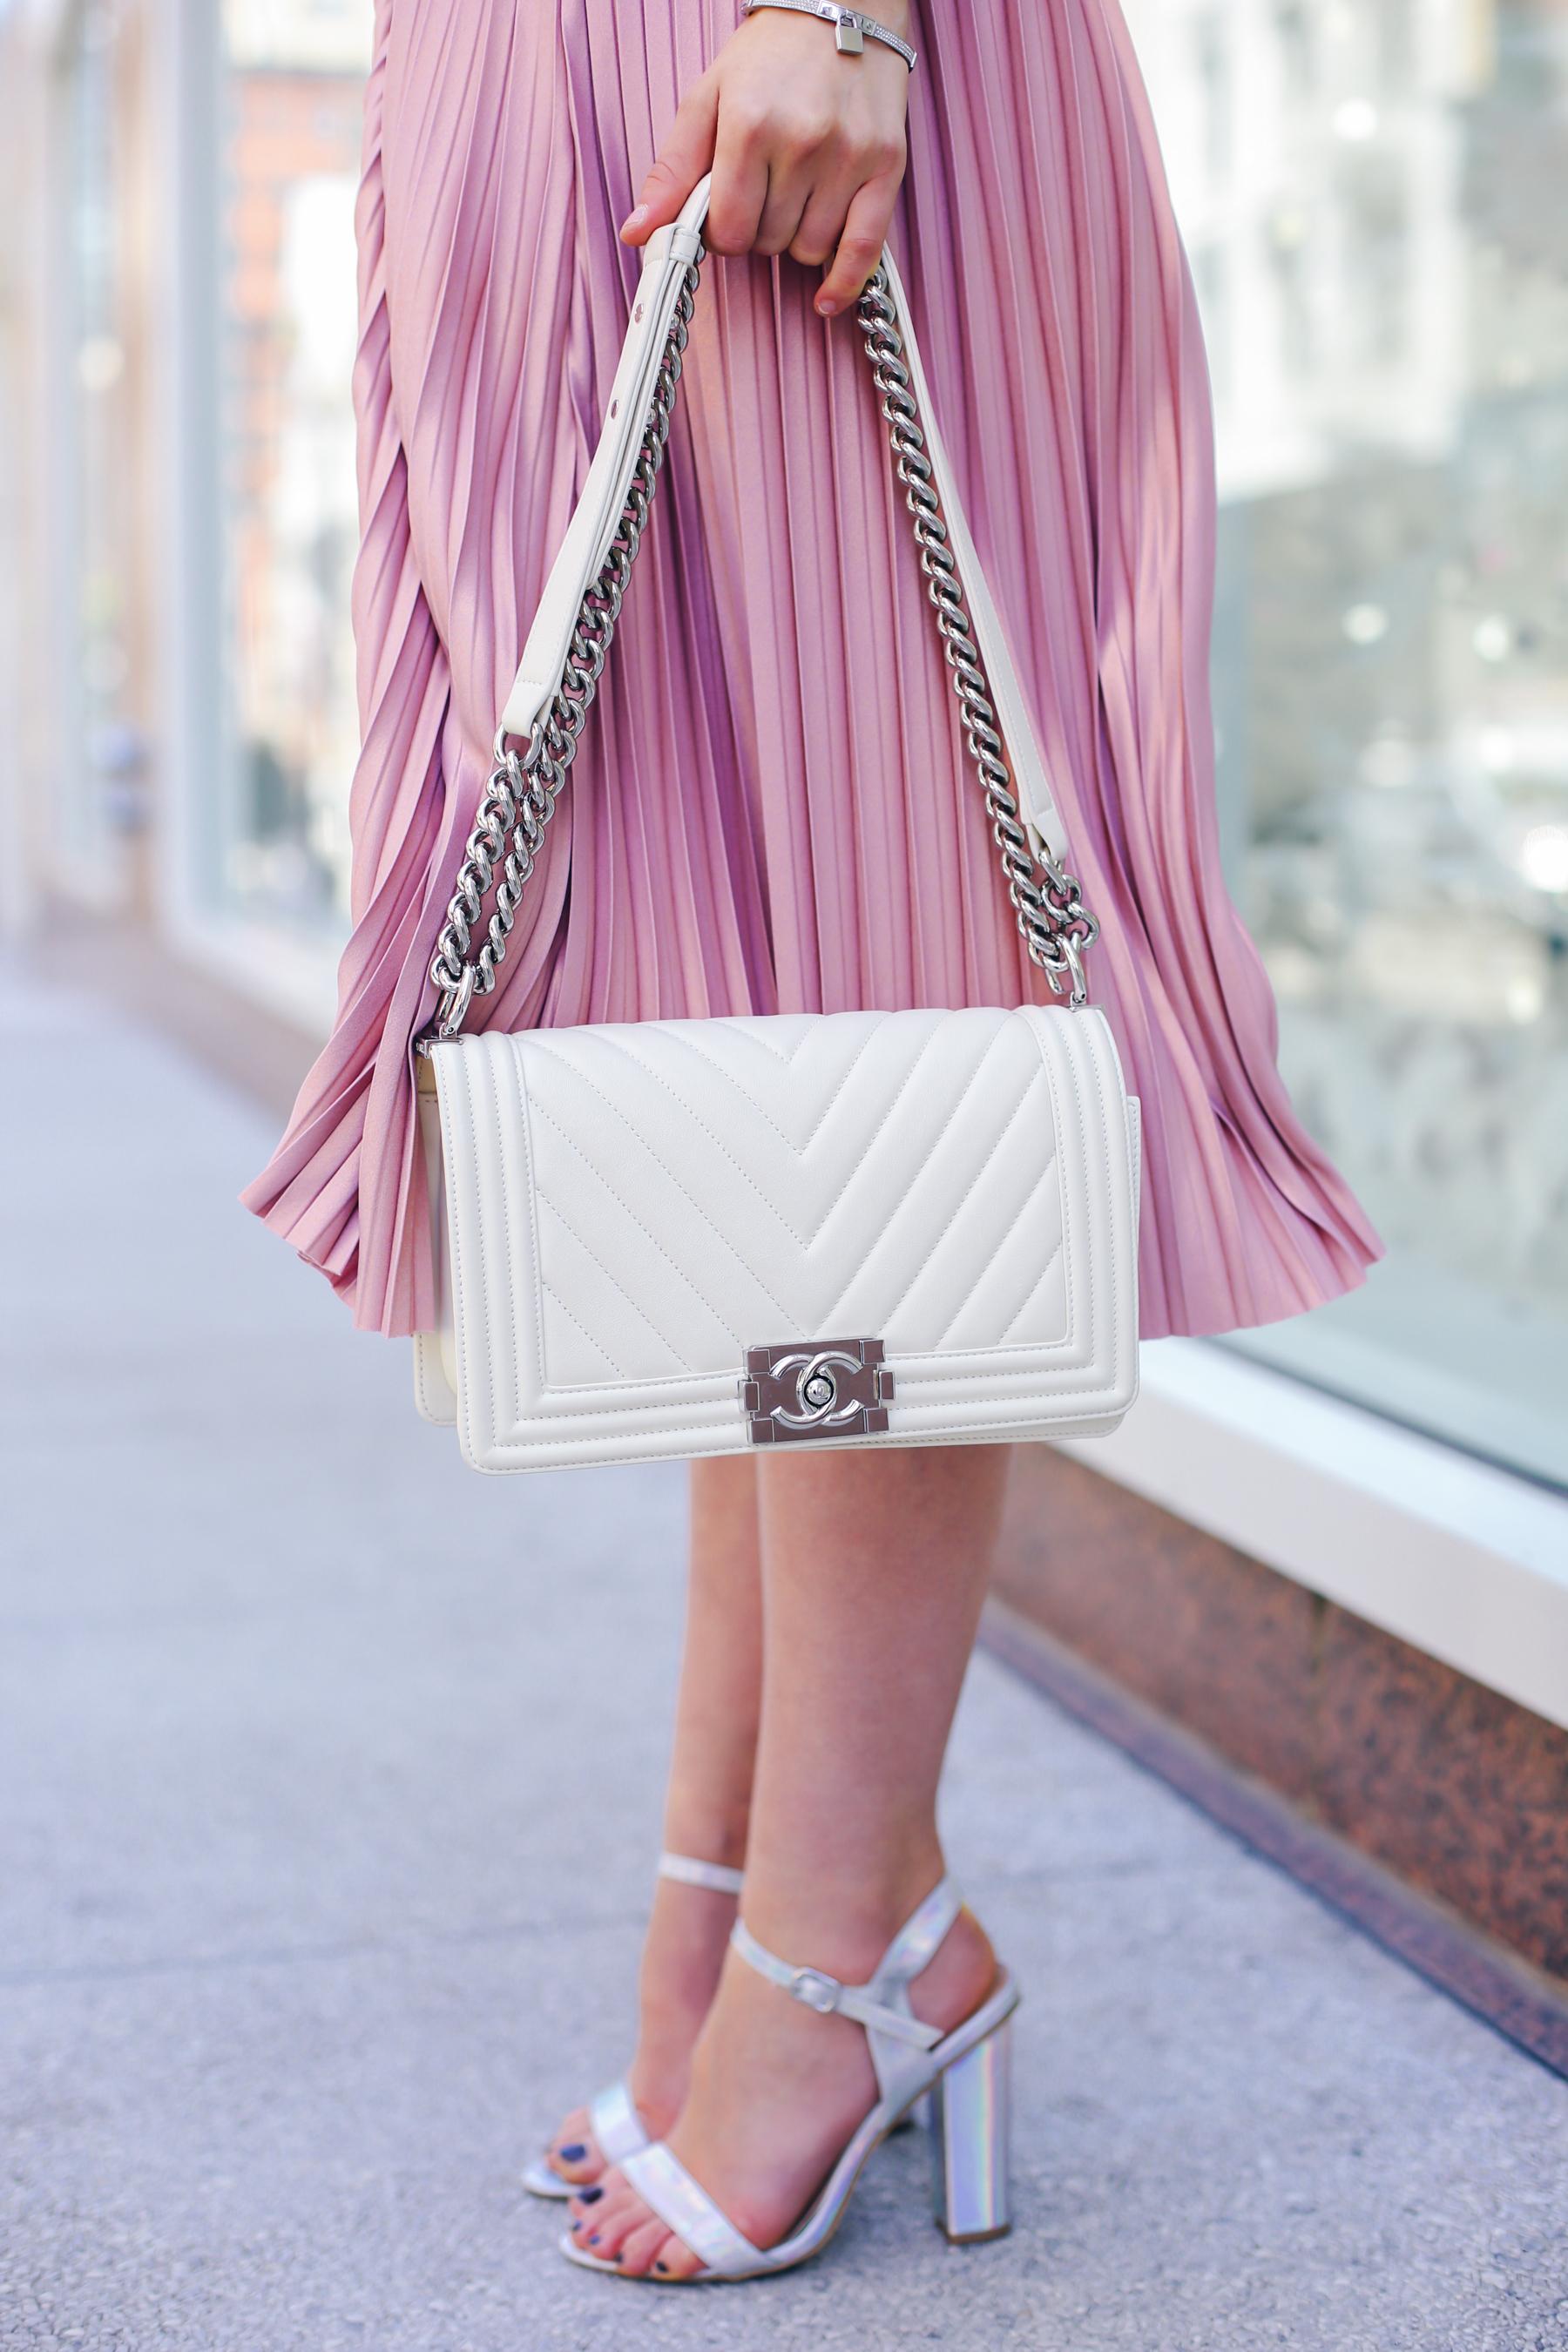 Barbora-Ondracova-FashioninmySoul-Fashion-Blogger-Photography-RyanbyRyanChua-7892